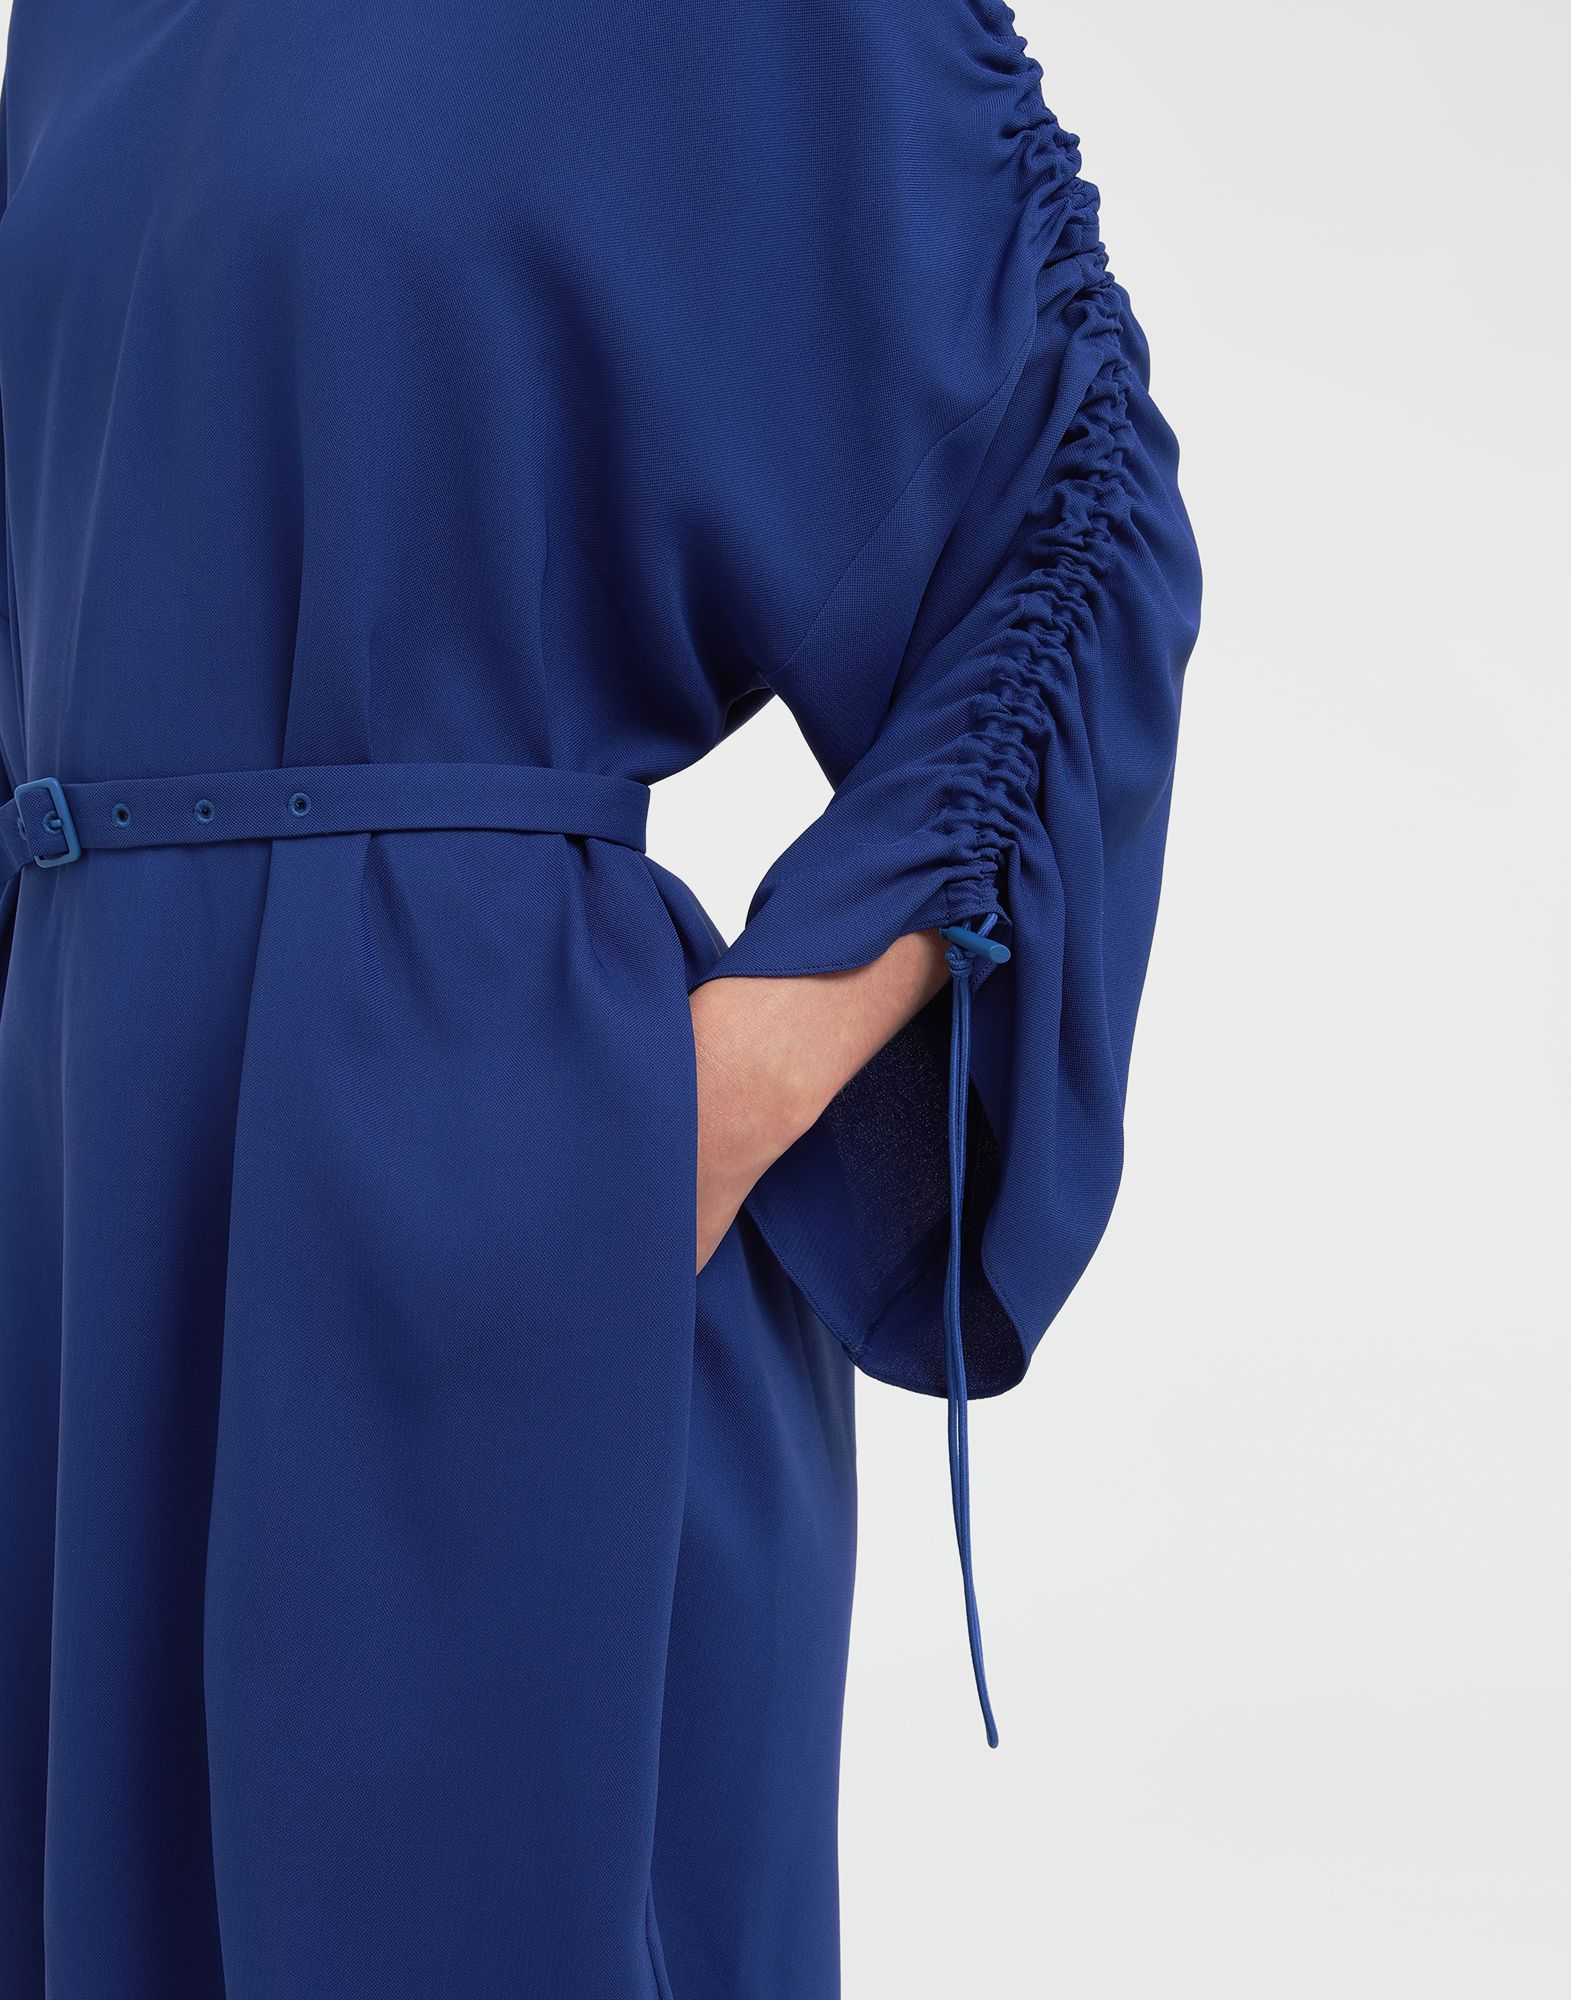 MAISON MARGIELA Ruched-sleeve jersey midi dress 3/4 length dress Woman a